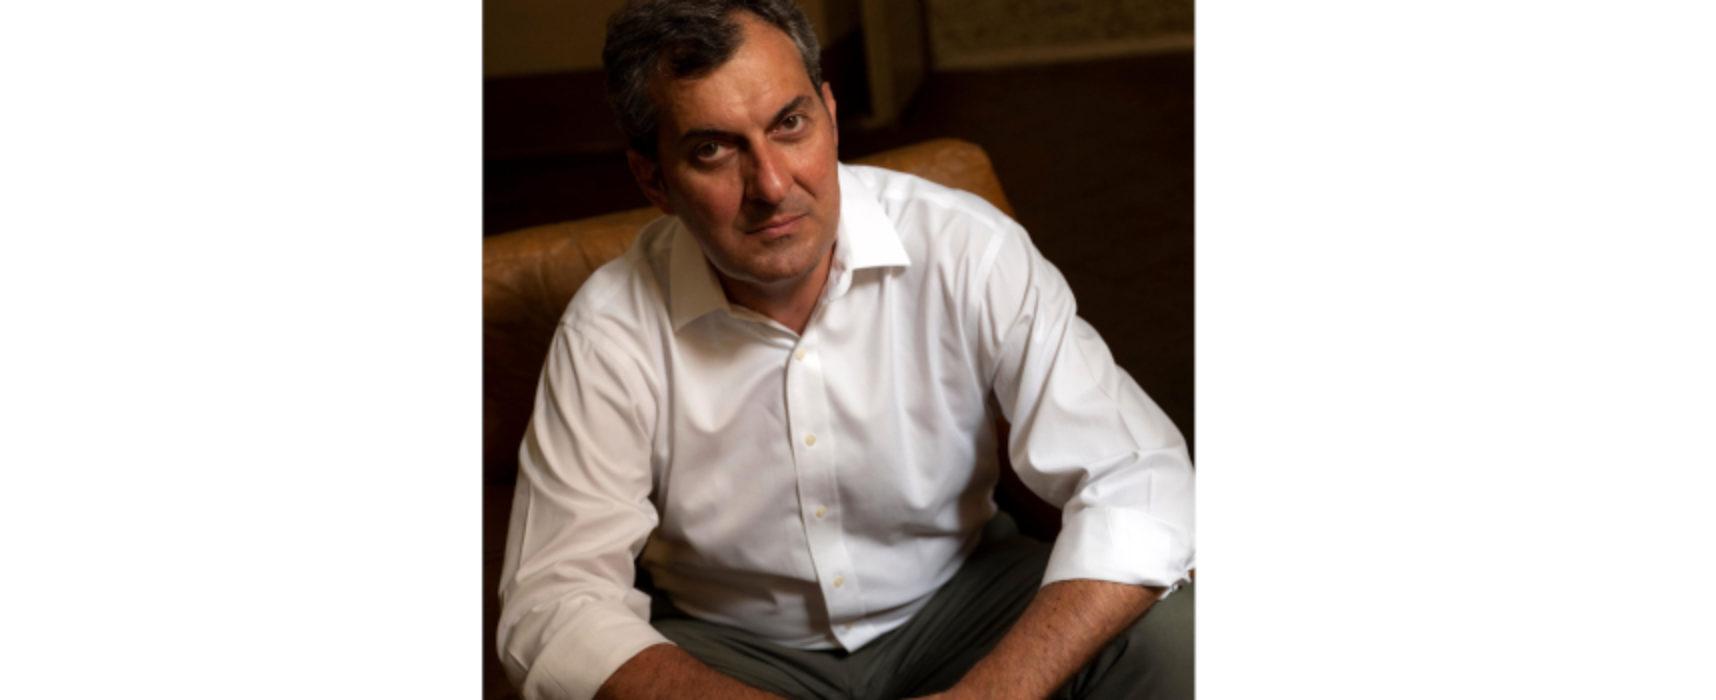 """Consigli d'Autore"" ospita Mario Calabresi / DIRETTA sulla pagina FACEBOOK di Bisceglie24"